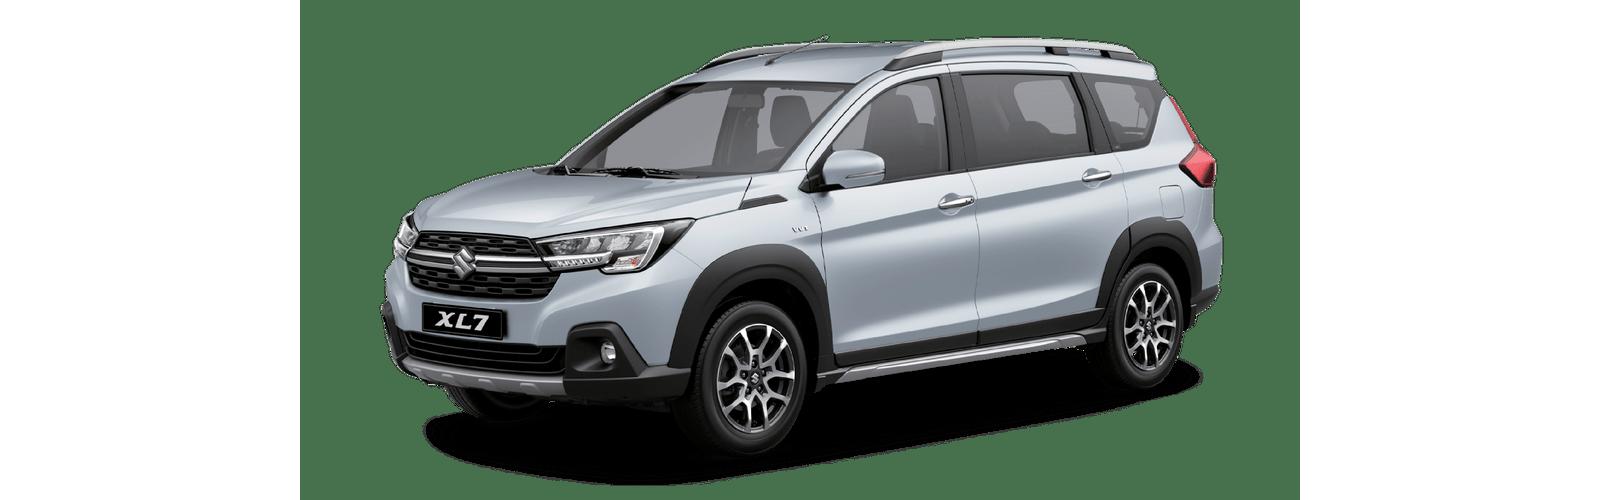 Suzuki-XL7-GLX-blanco.png